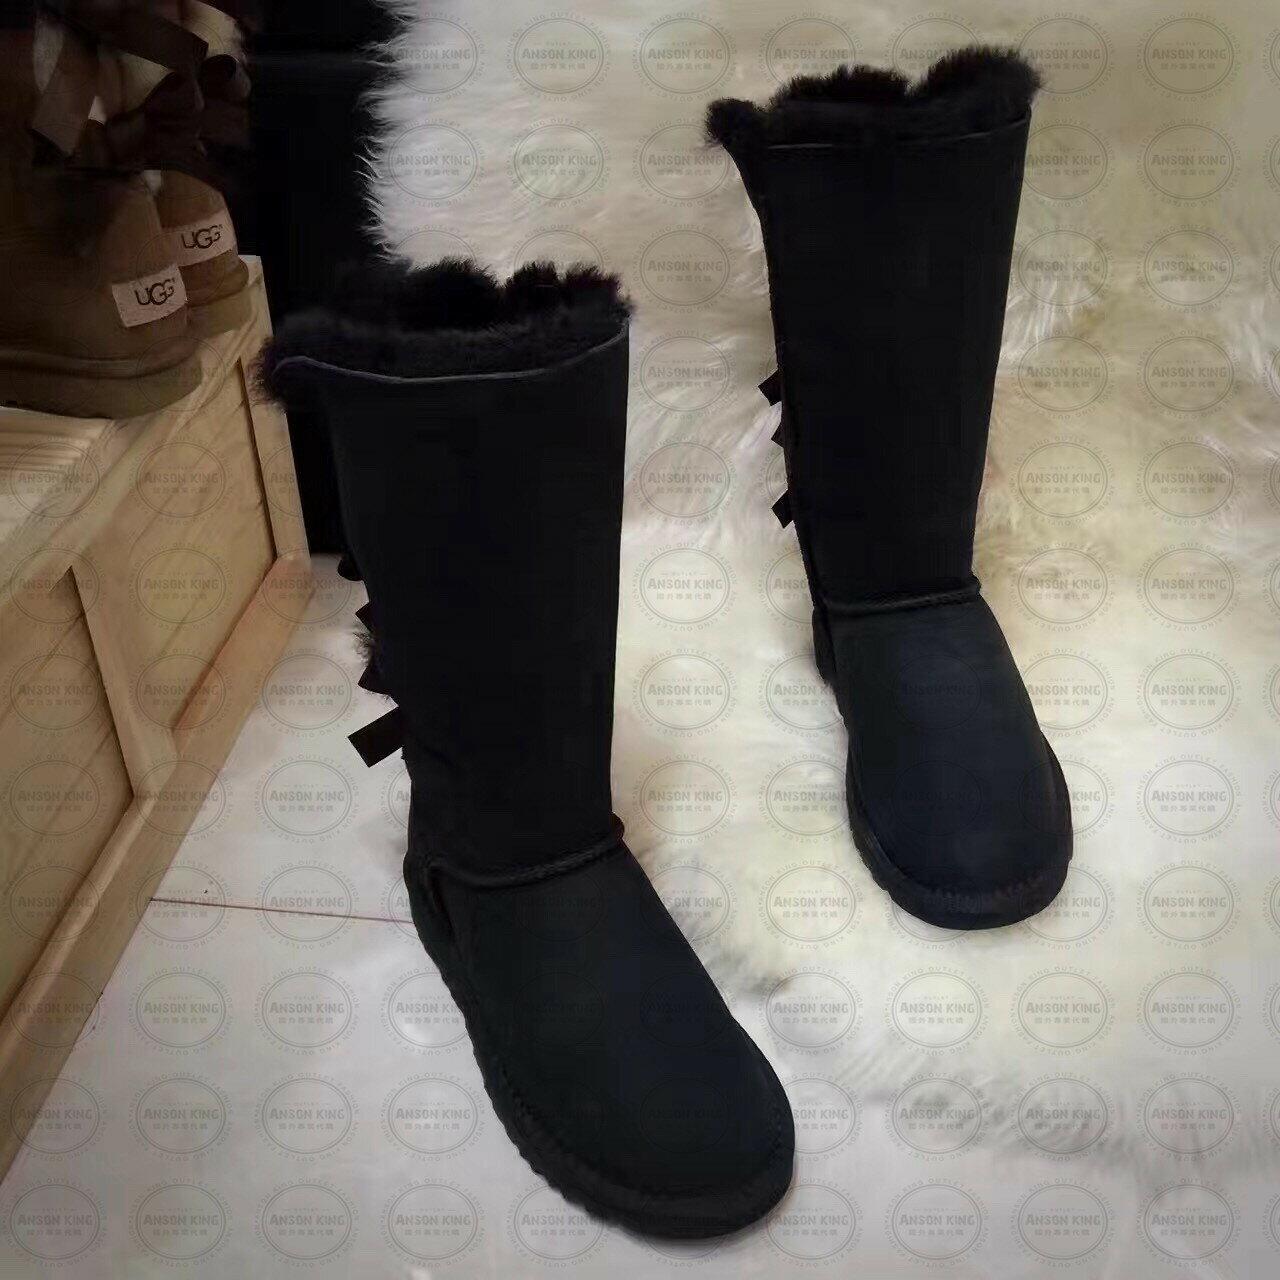 OUTLET正品代購 澳洲 UGG 一體女式絲帶蝴蝶結 保暖 真皮羊皮毛 雪靴 短靴 黑色 0